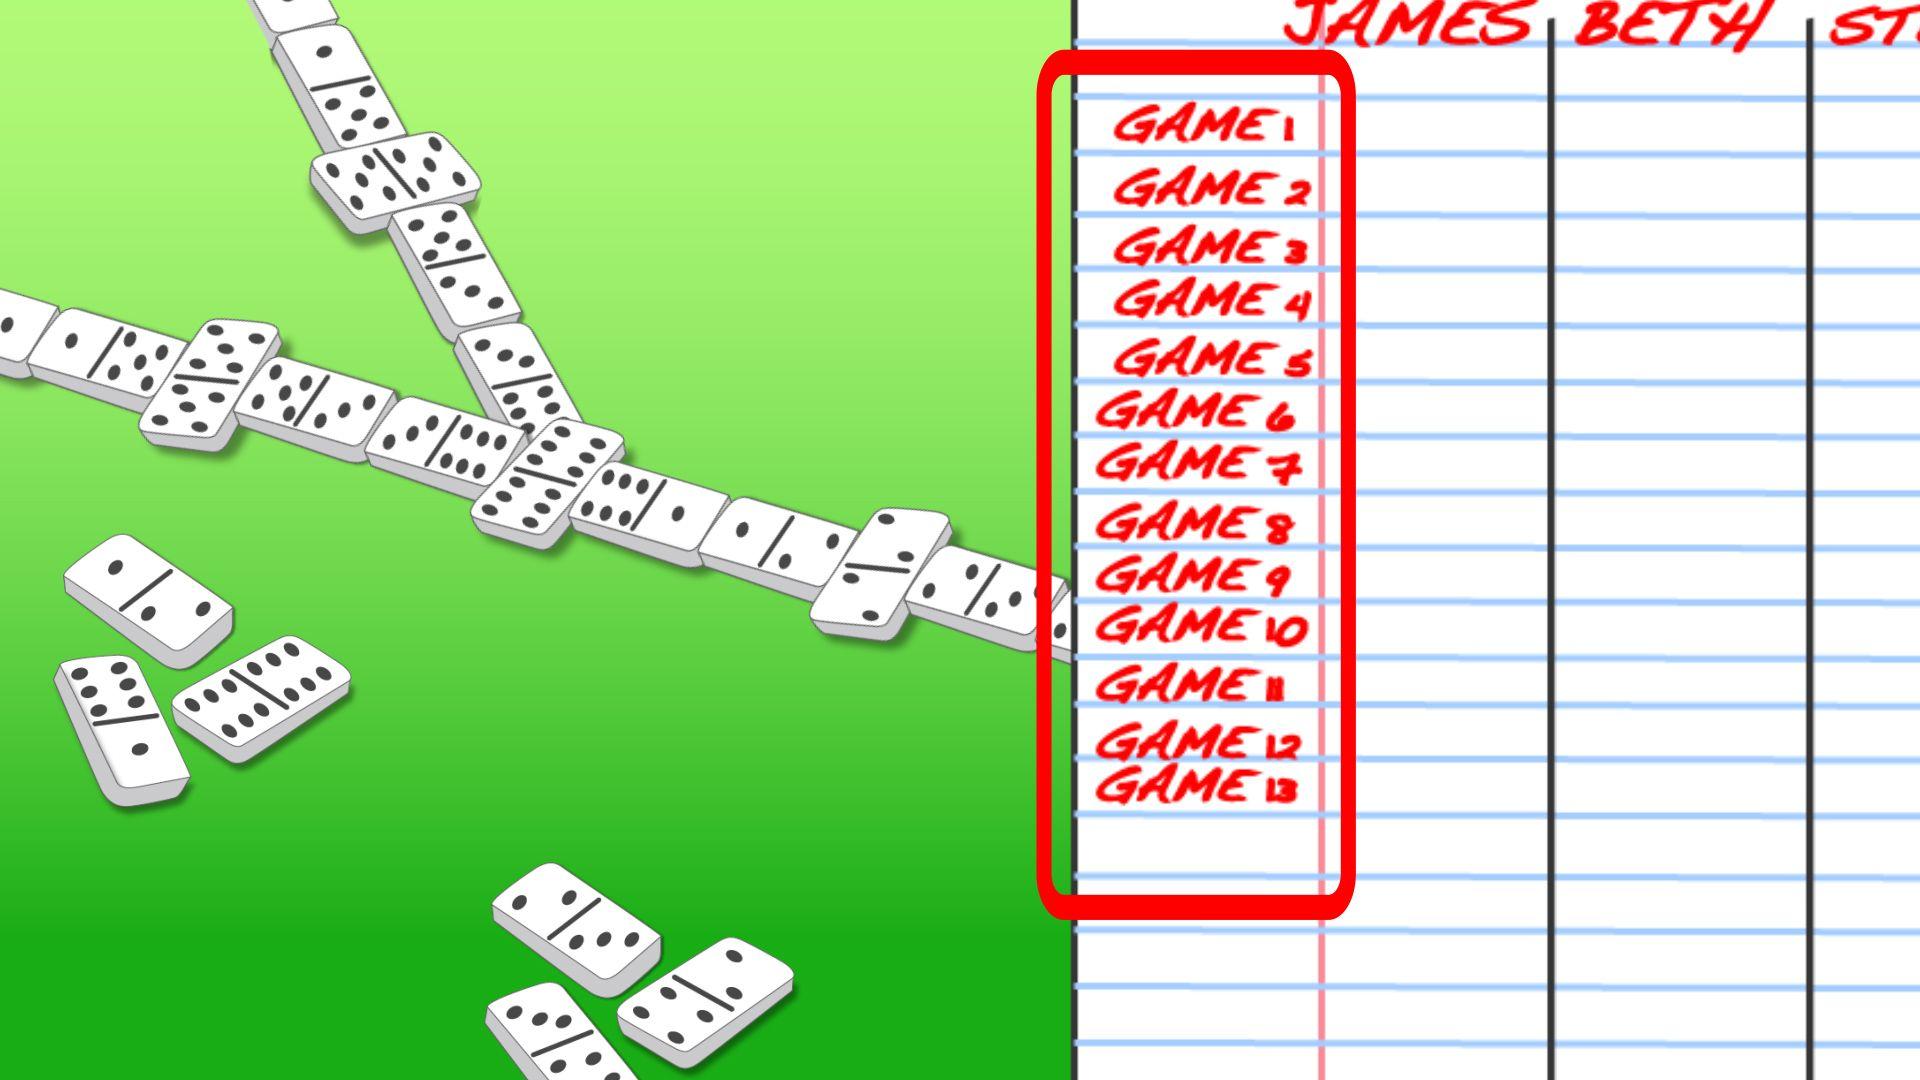 Play Mexican Train Domino Game Juego de domino, Mexicano